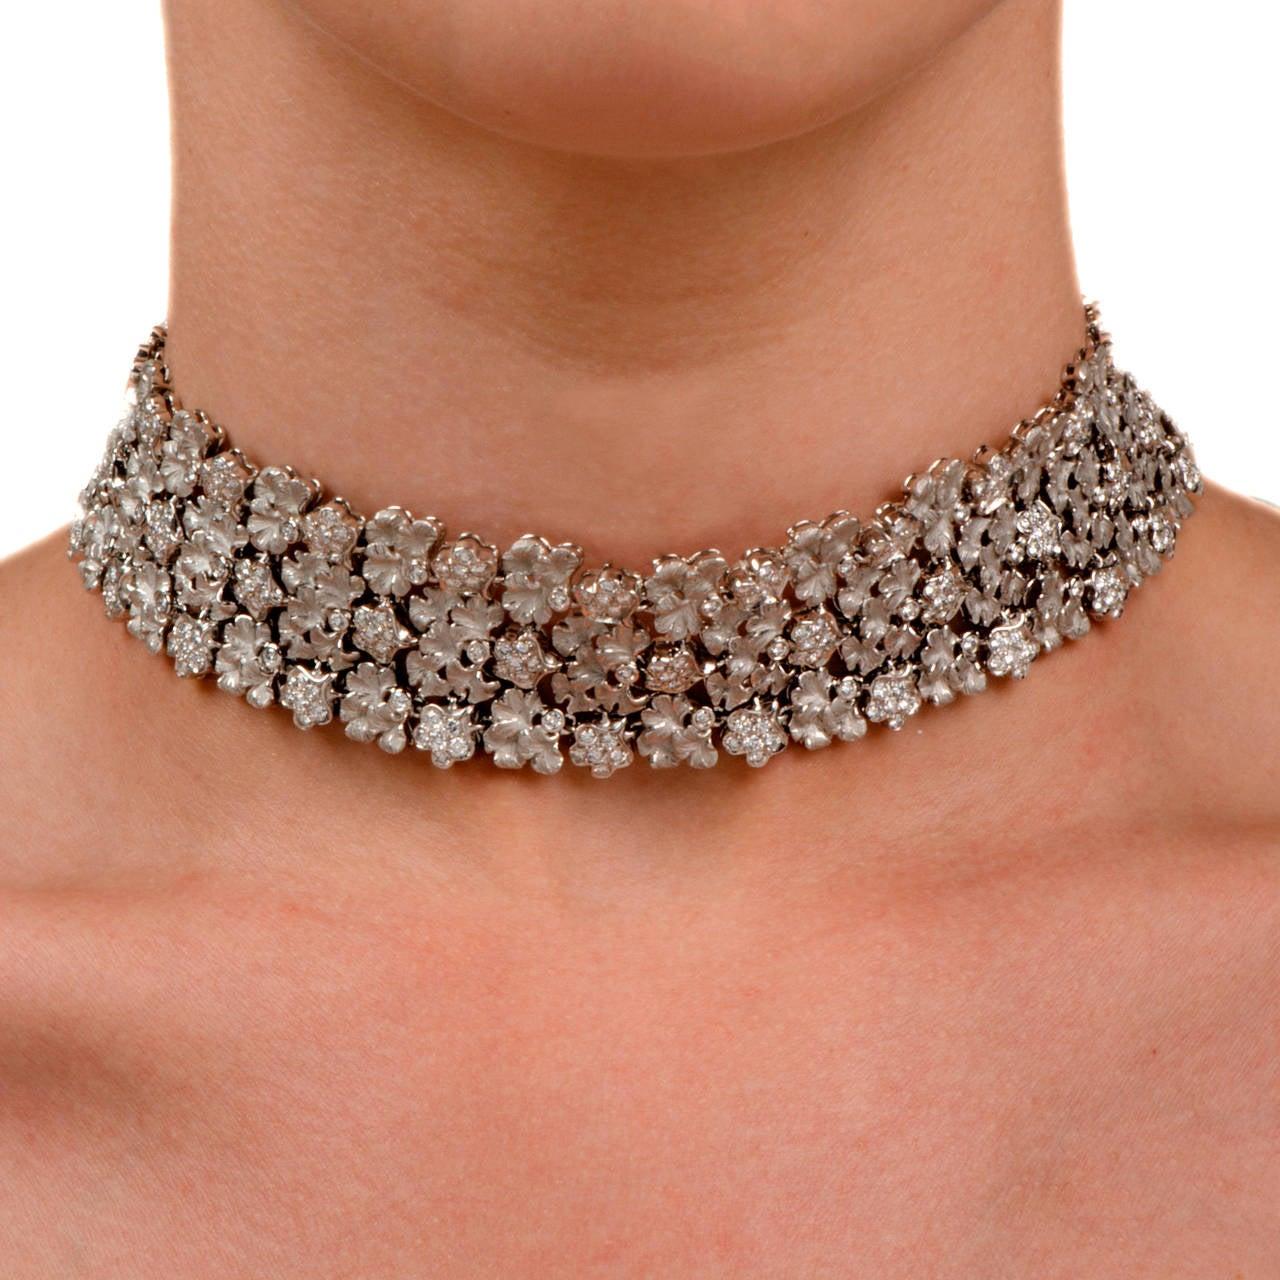 Carrera y Carrera Diamond Gold Wreath Choker Necklace 2